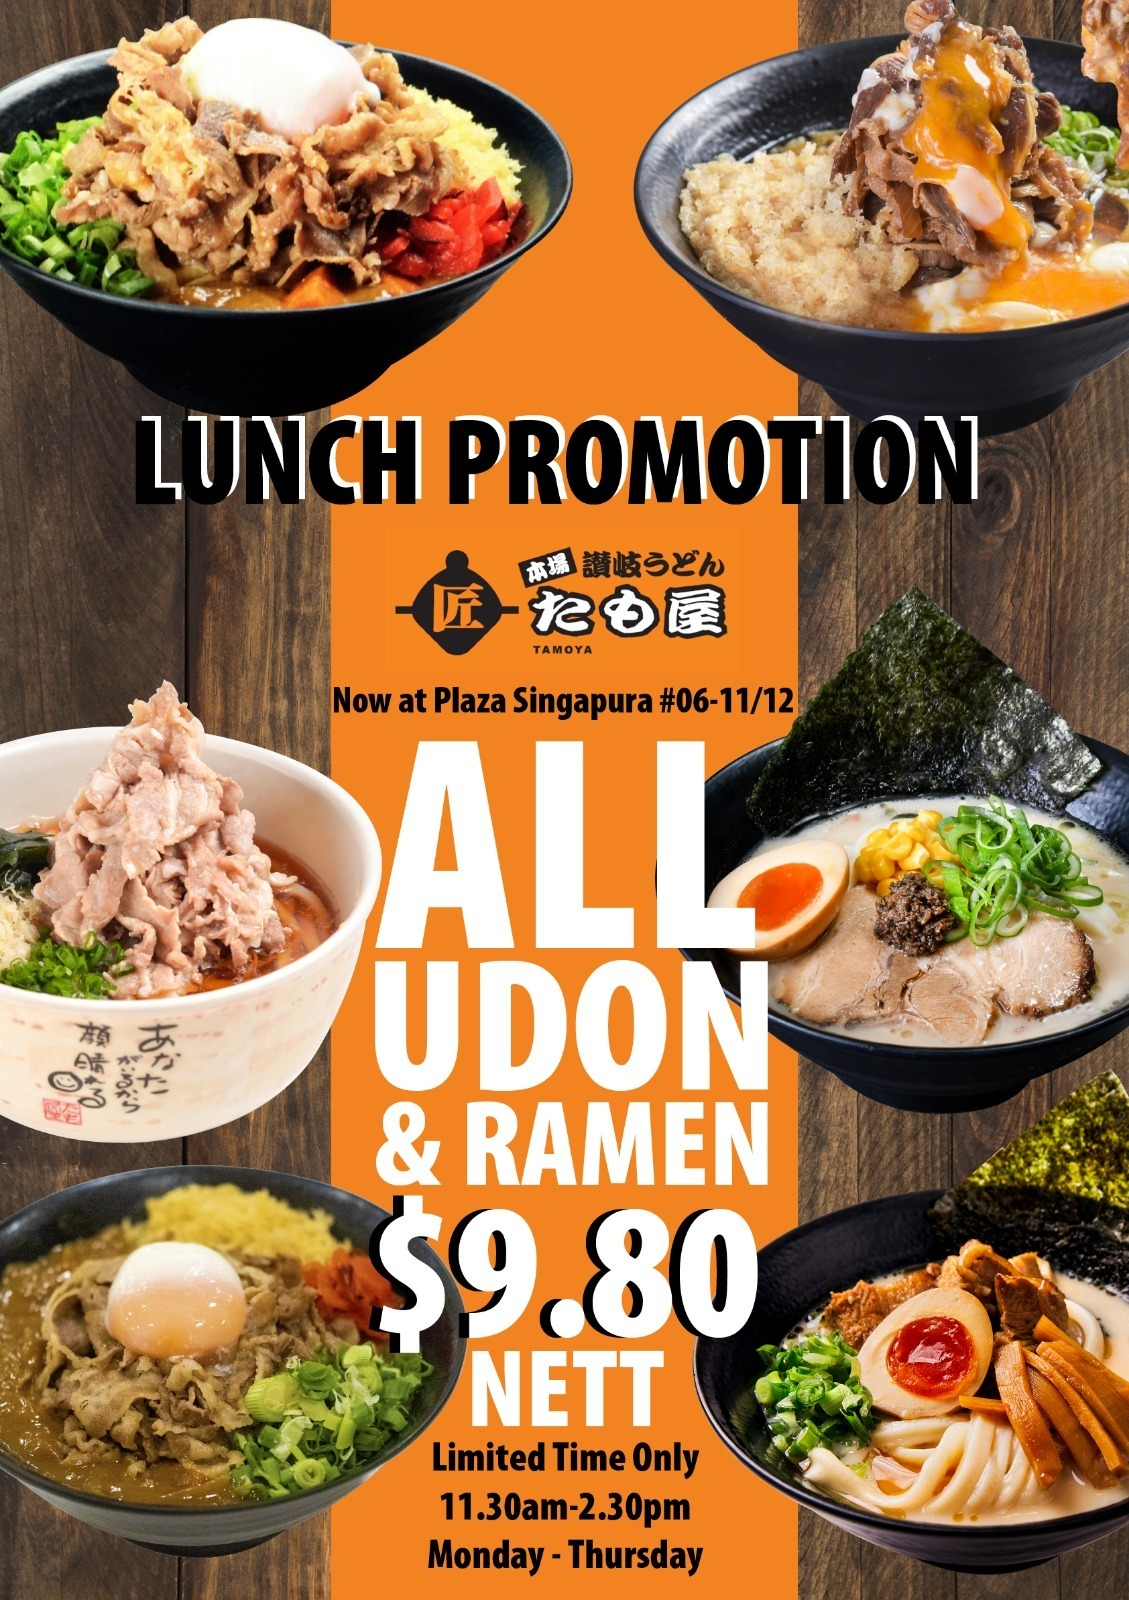 $9.80 NETT On All Udon & Ramen At Tamoya Udon Plaza Singapura   Why Not Deals & Promotions